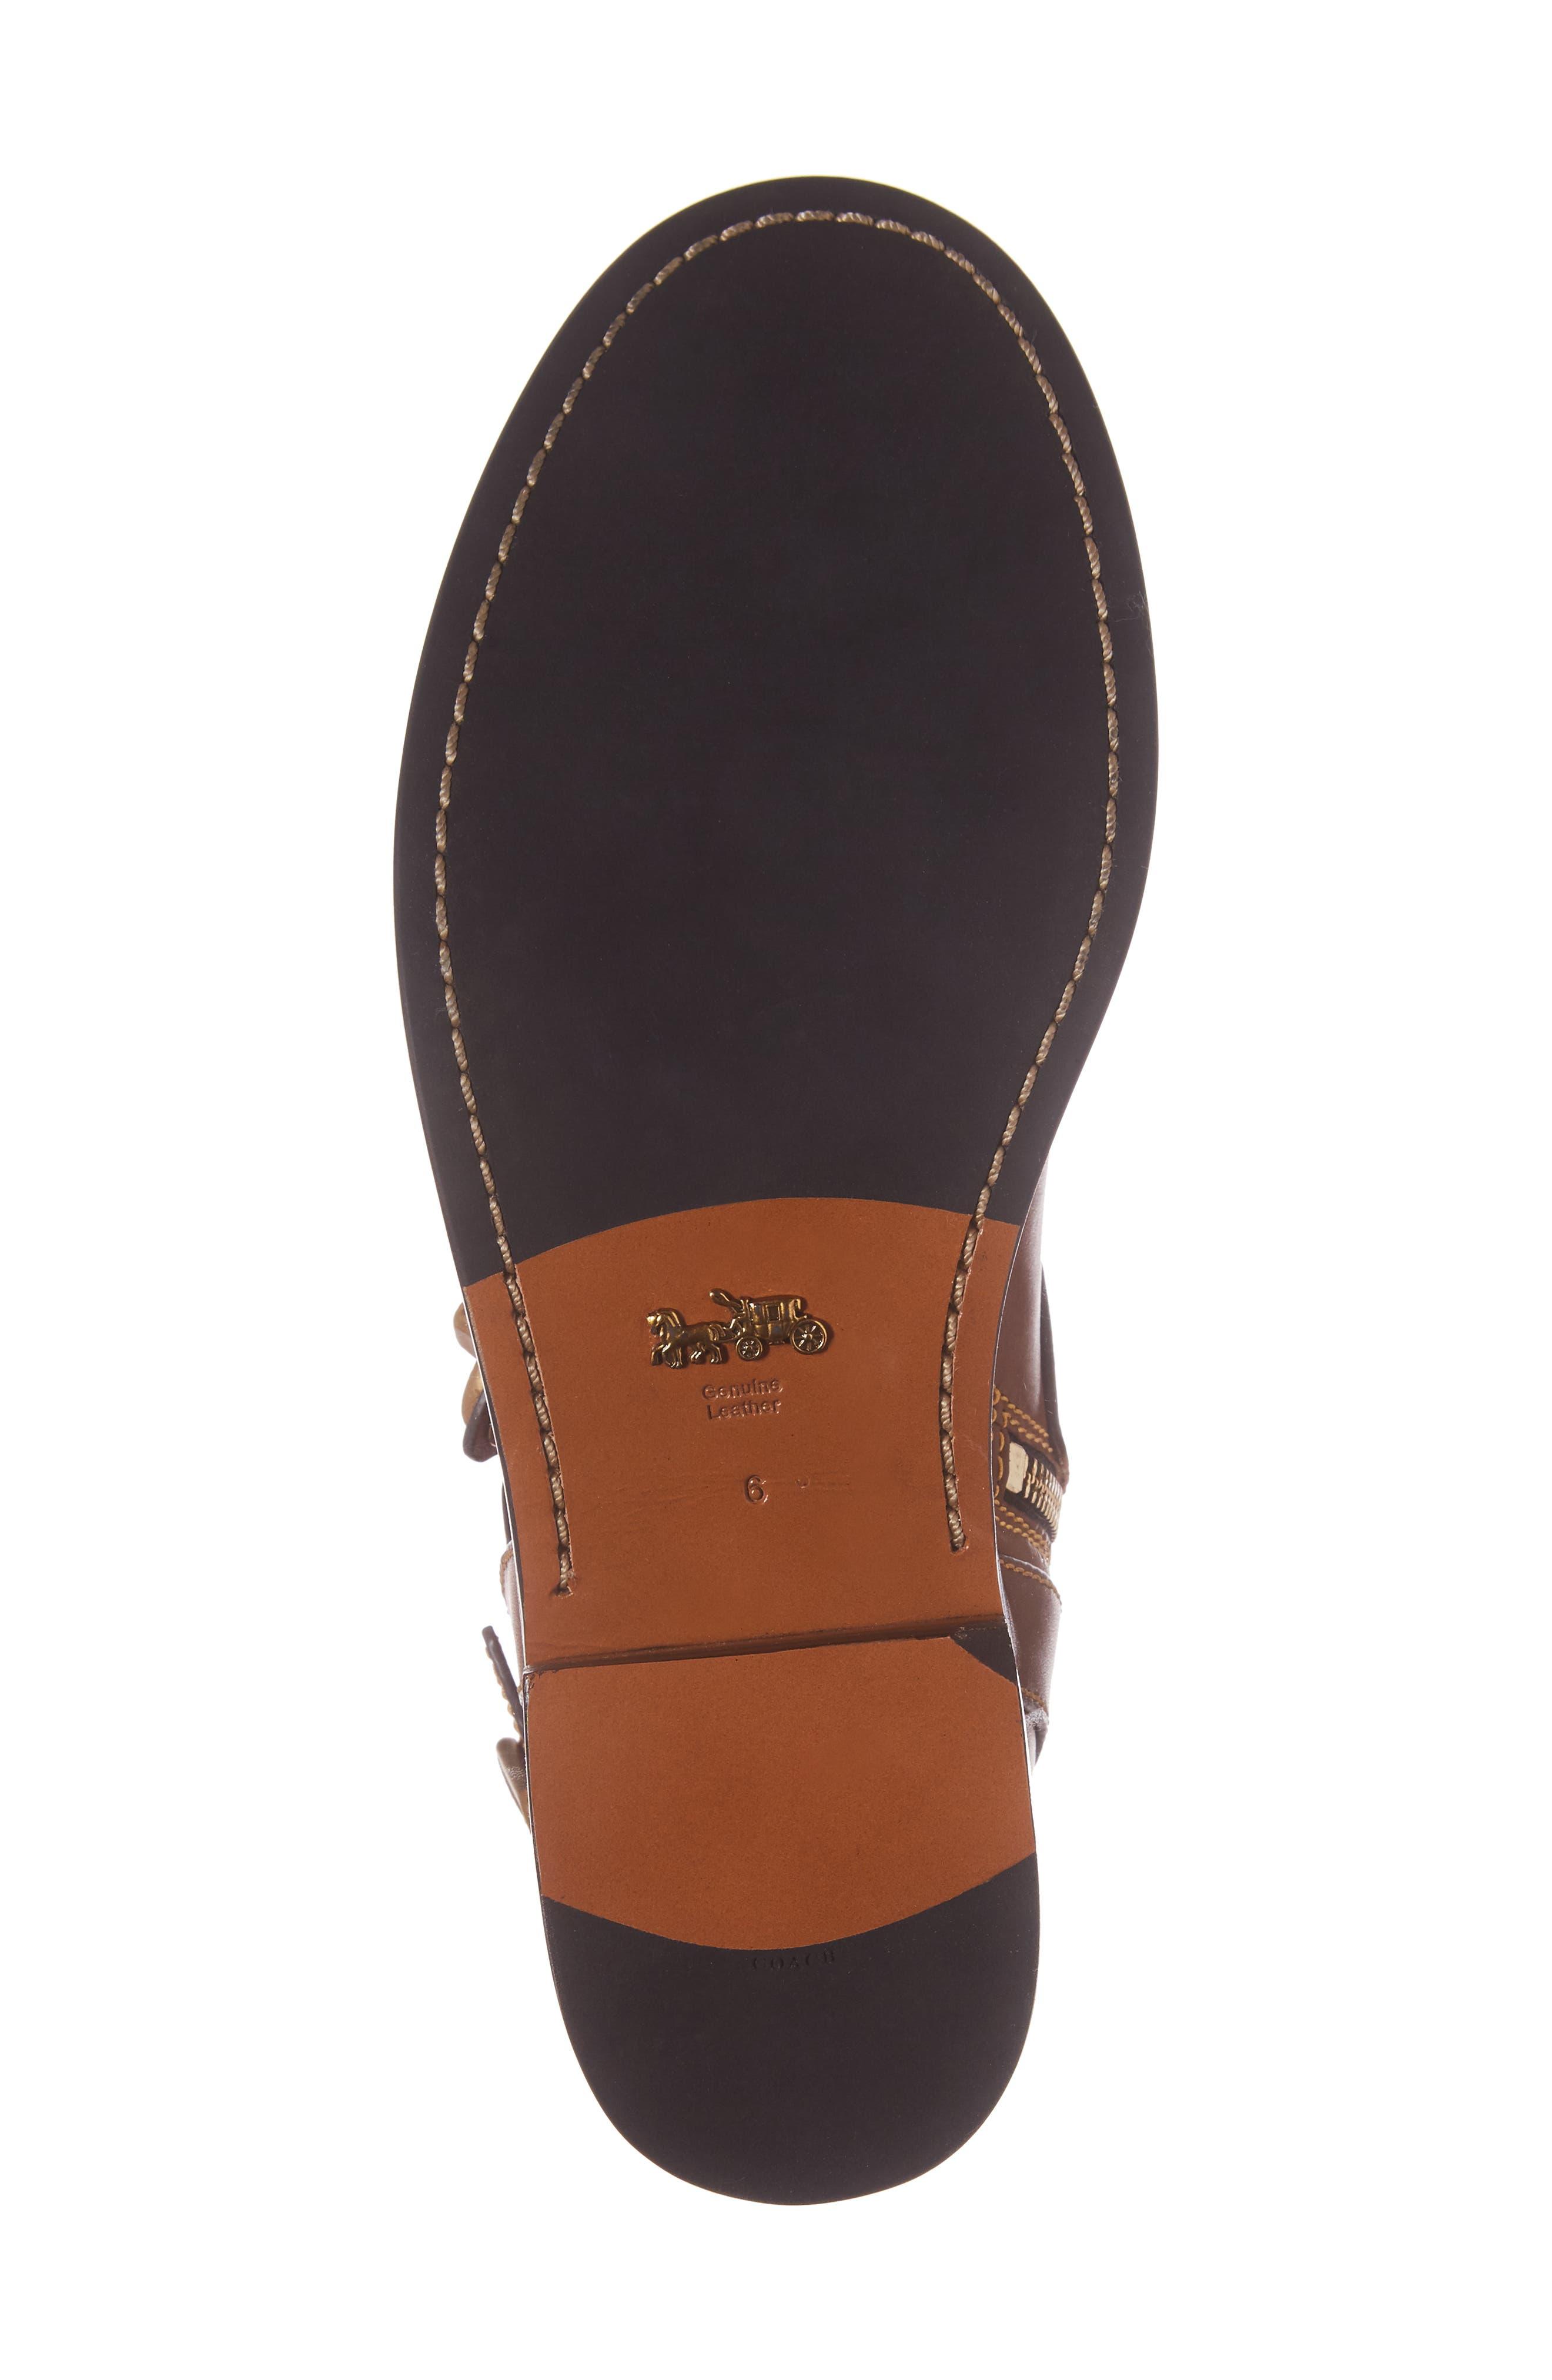 Moto Bootie,                             Alternate thumbnail 6, color,                             Dark Saddle Leather